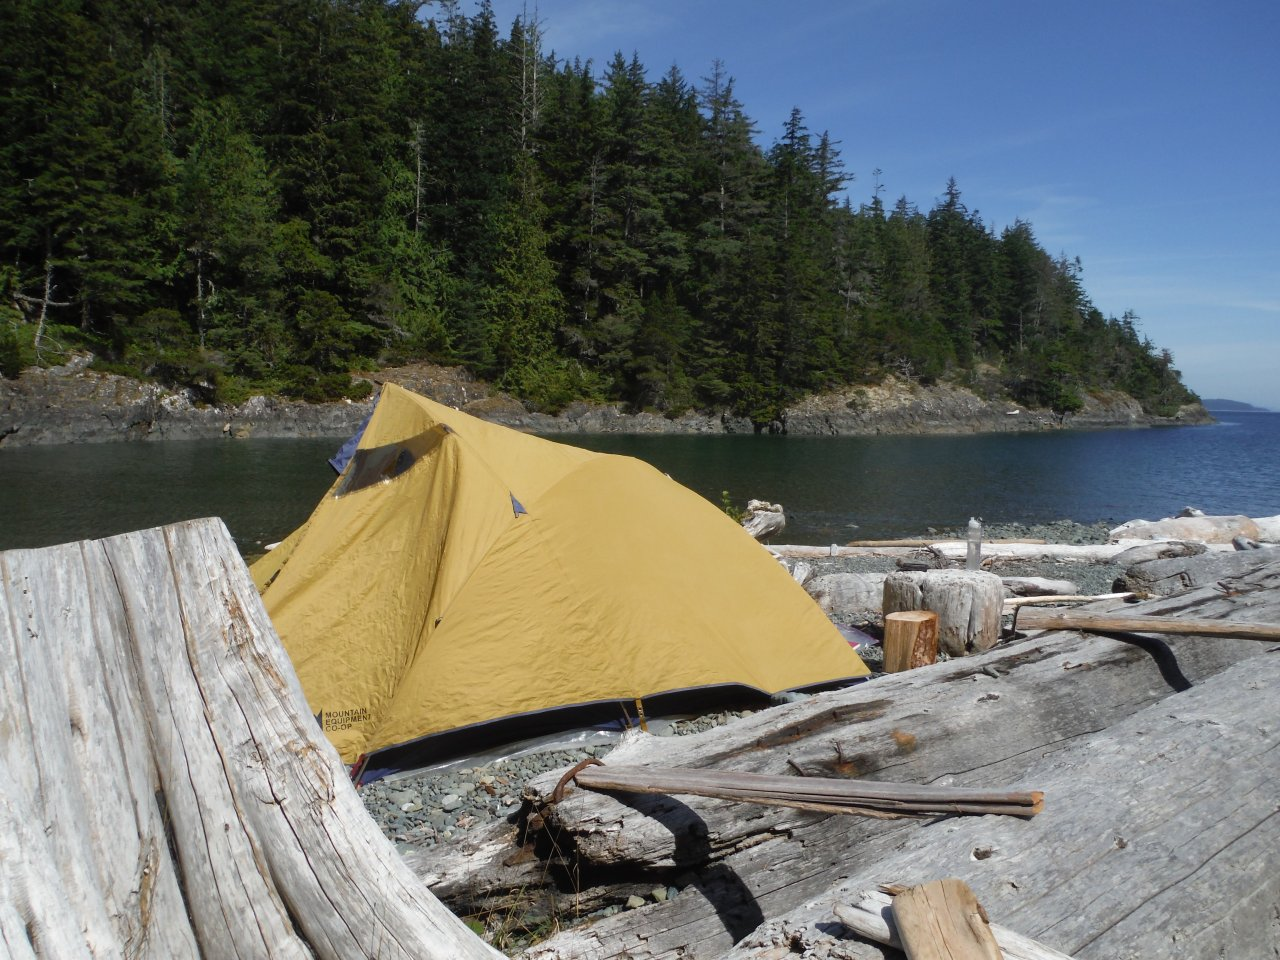 trip_day3_Blinkhorn_tent.JPG